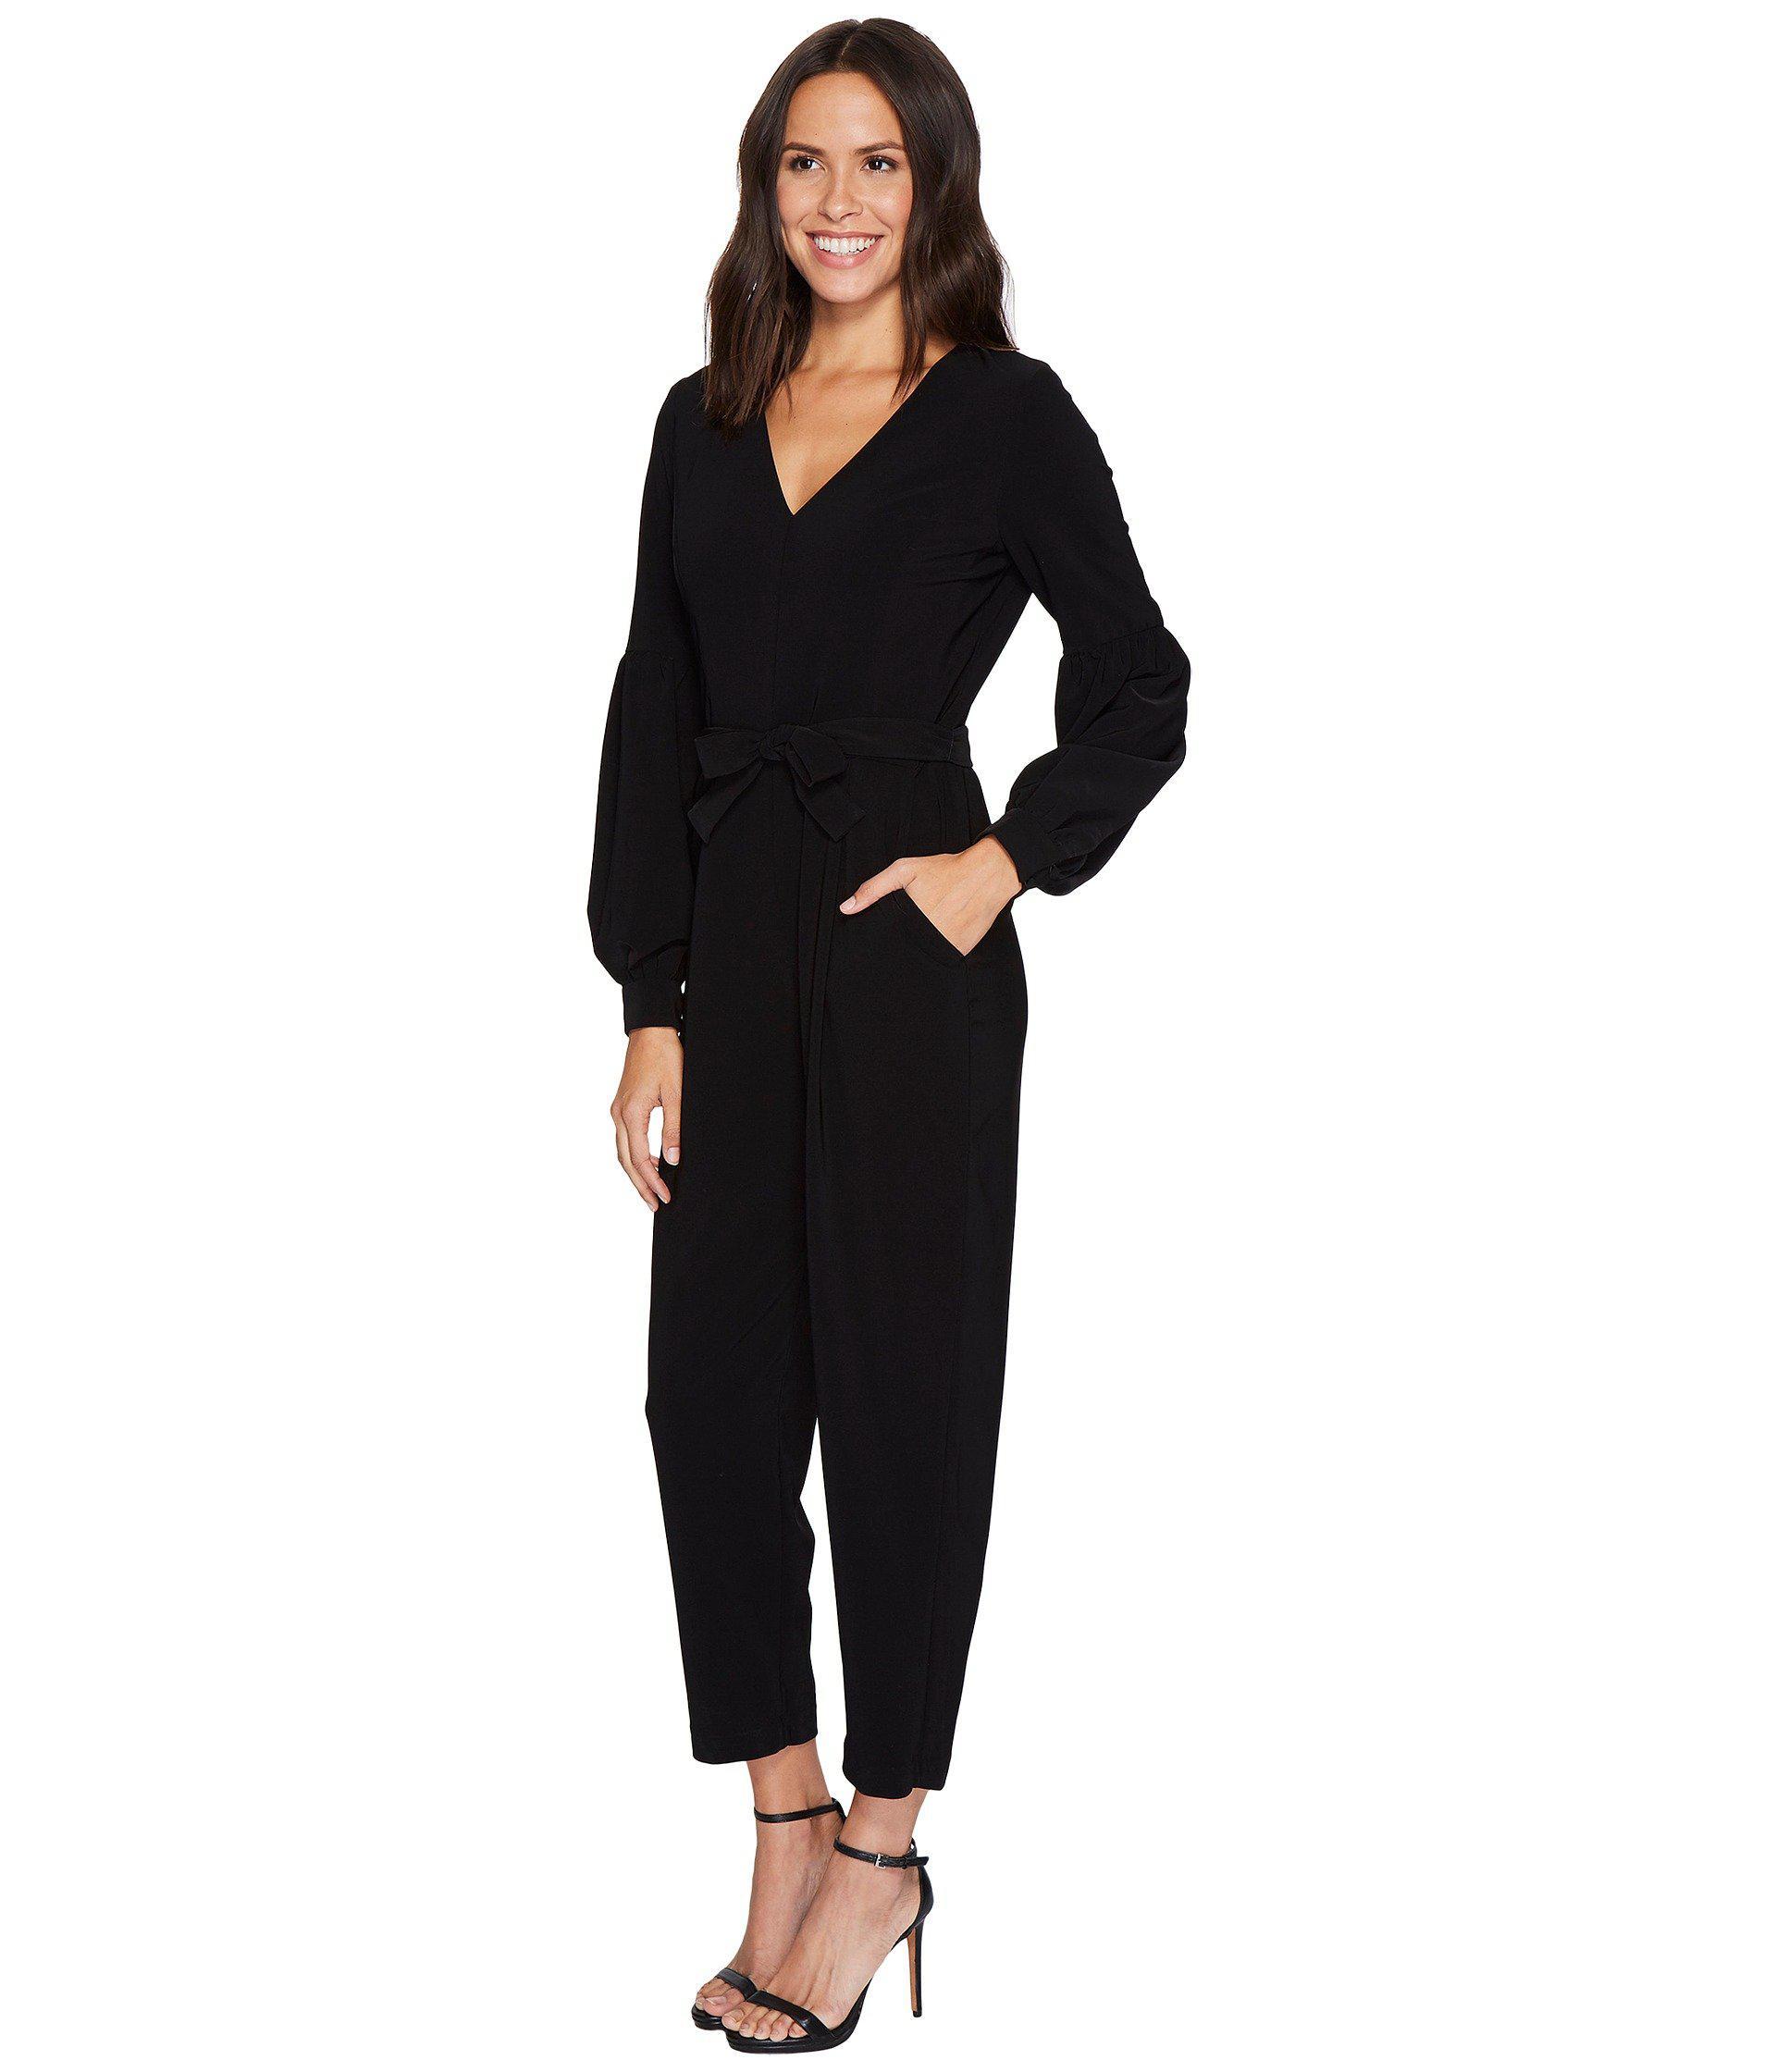 fc3722d28b0 Lyst - Maggy London Lantern Sleeve Ankle Jumpsuit in Black